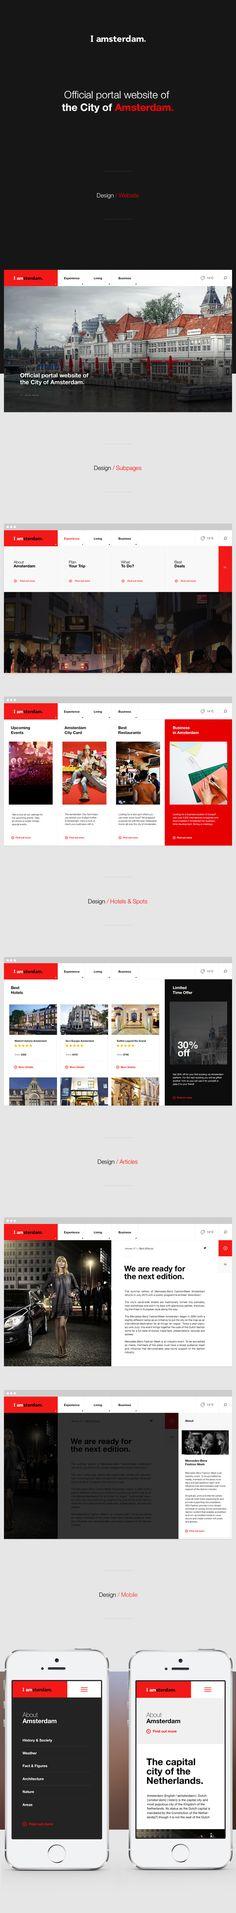 IAmsterdam UI   Abduzeedo Design Inspiration